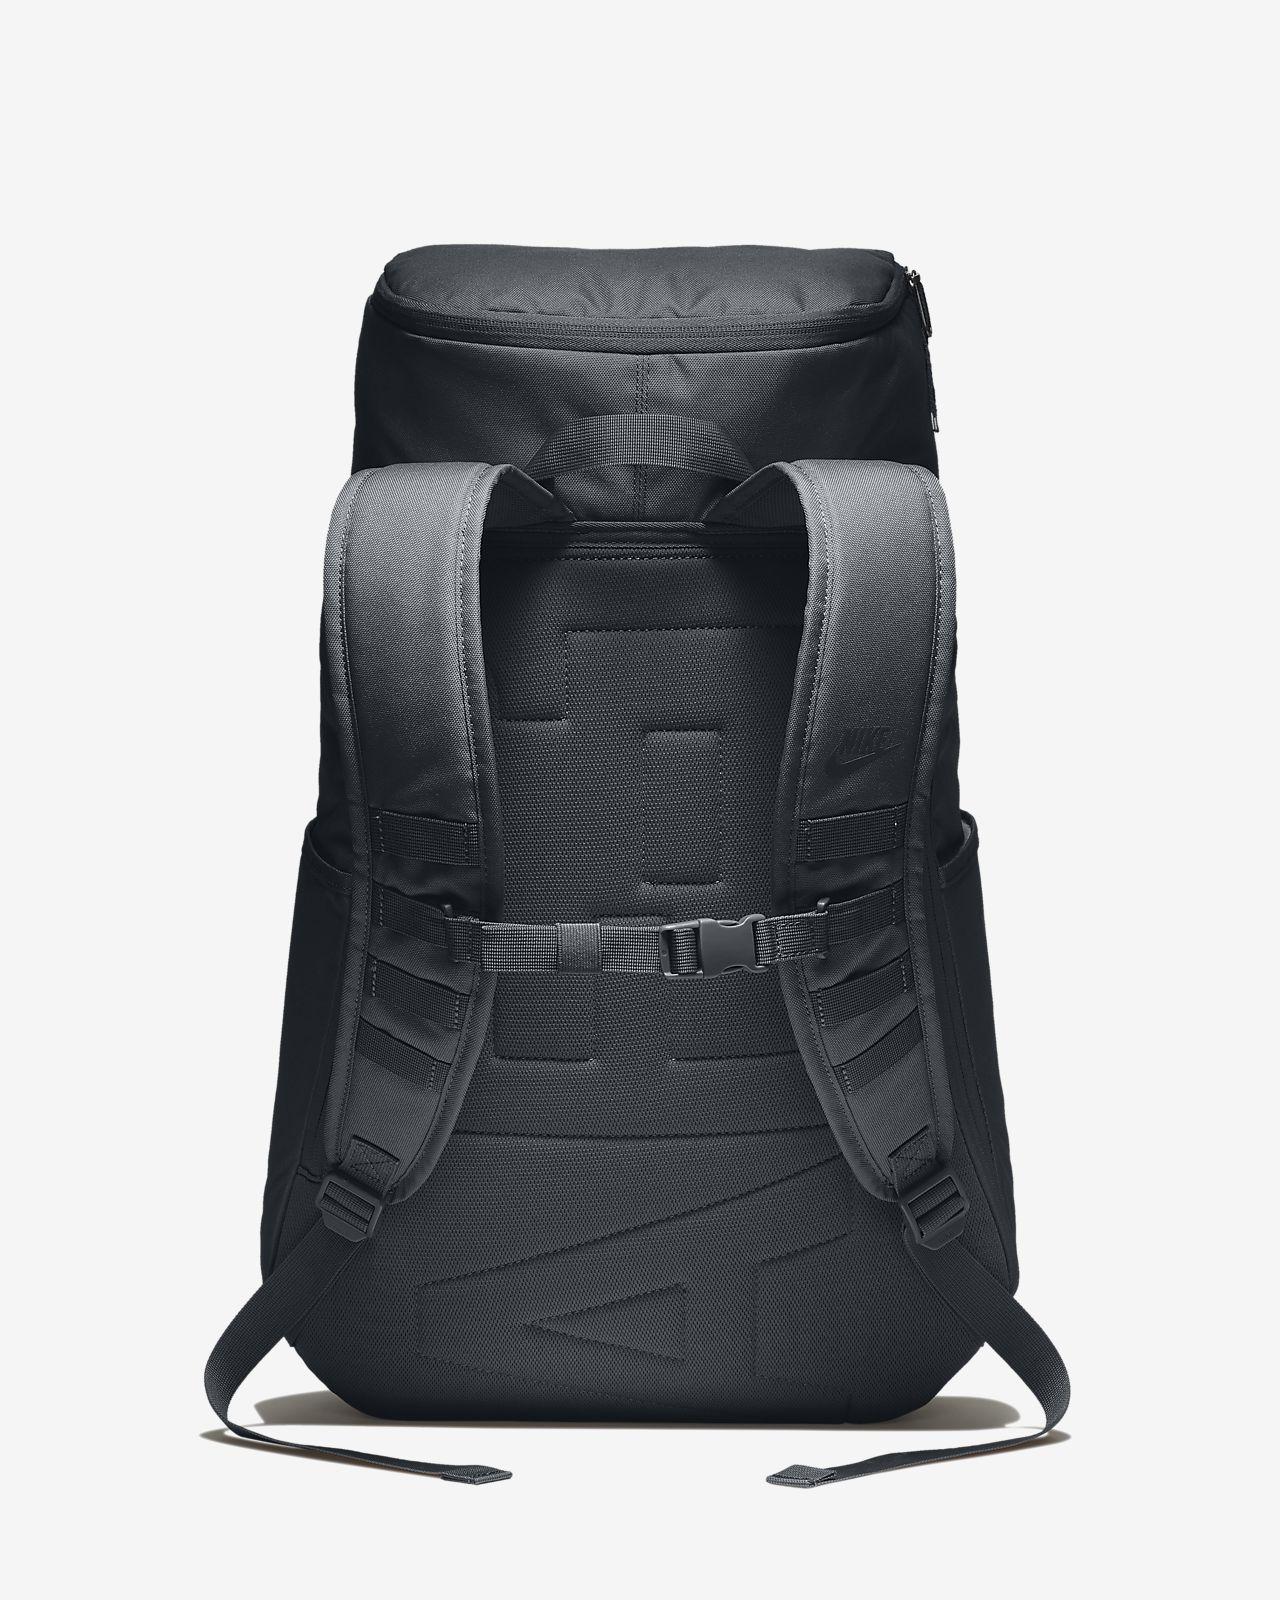 0327e7e9c0 Low Resolution Nike Sportswear AF1 Backpack Nike Sportswear AF1 Backpack